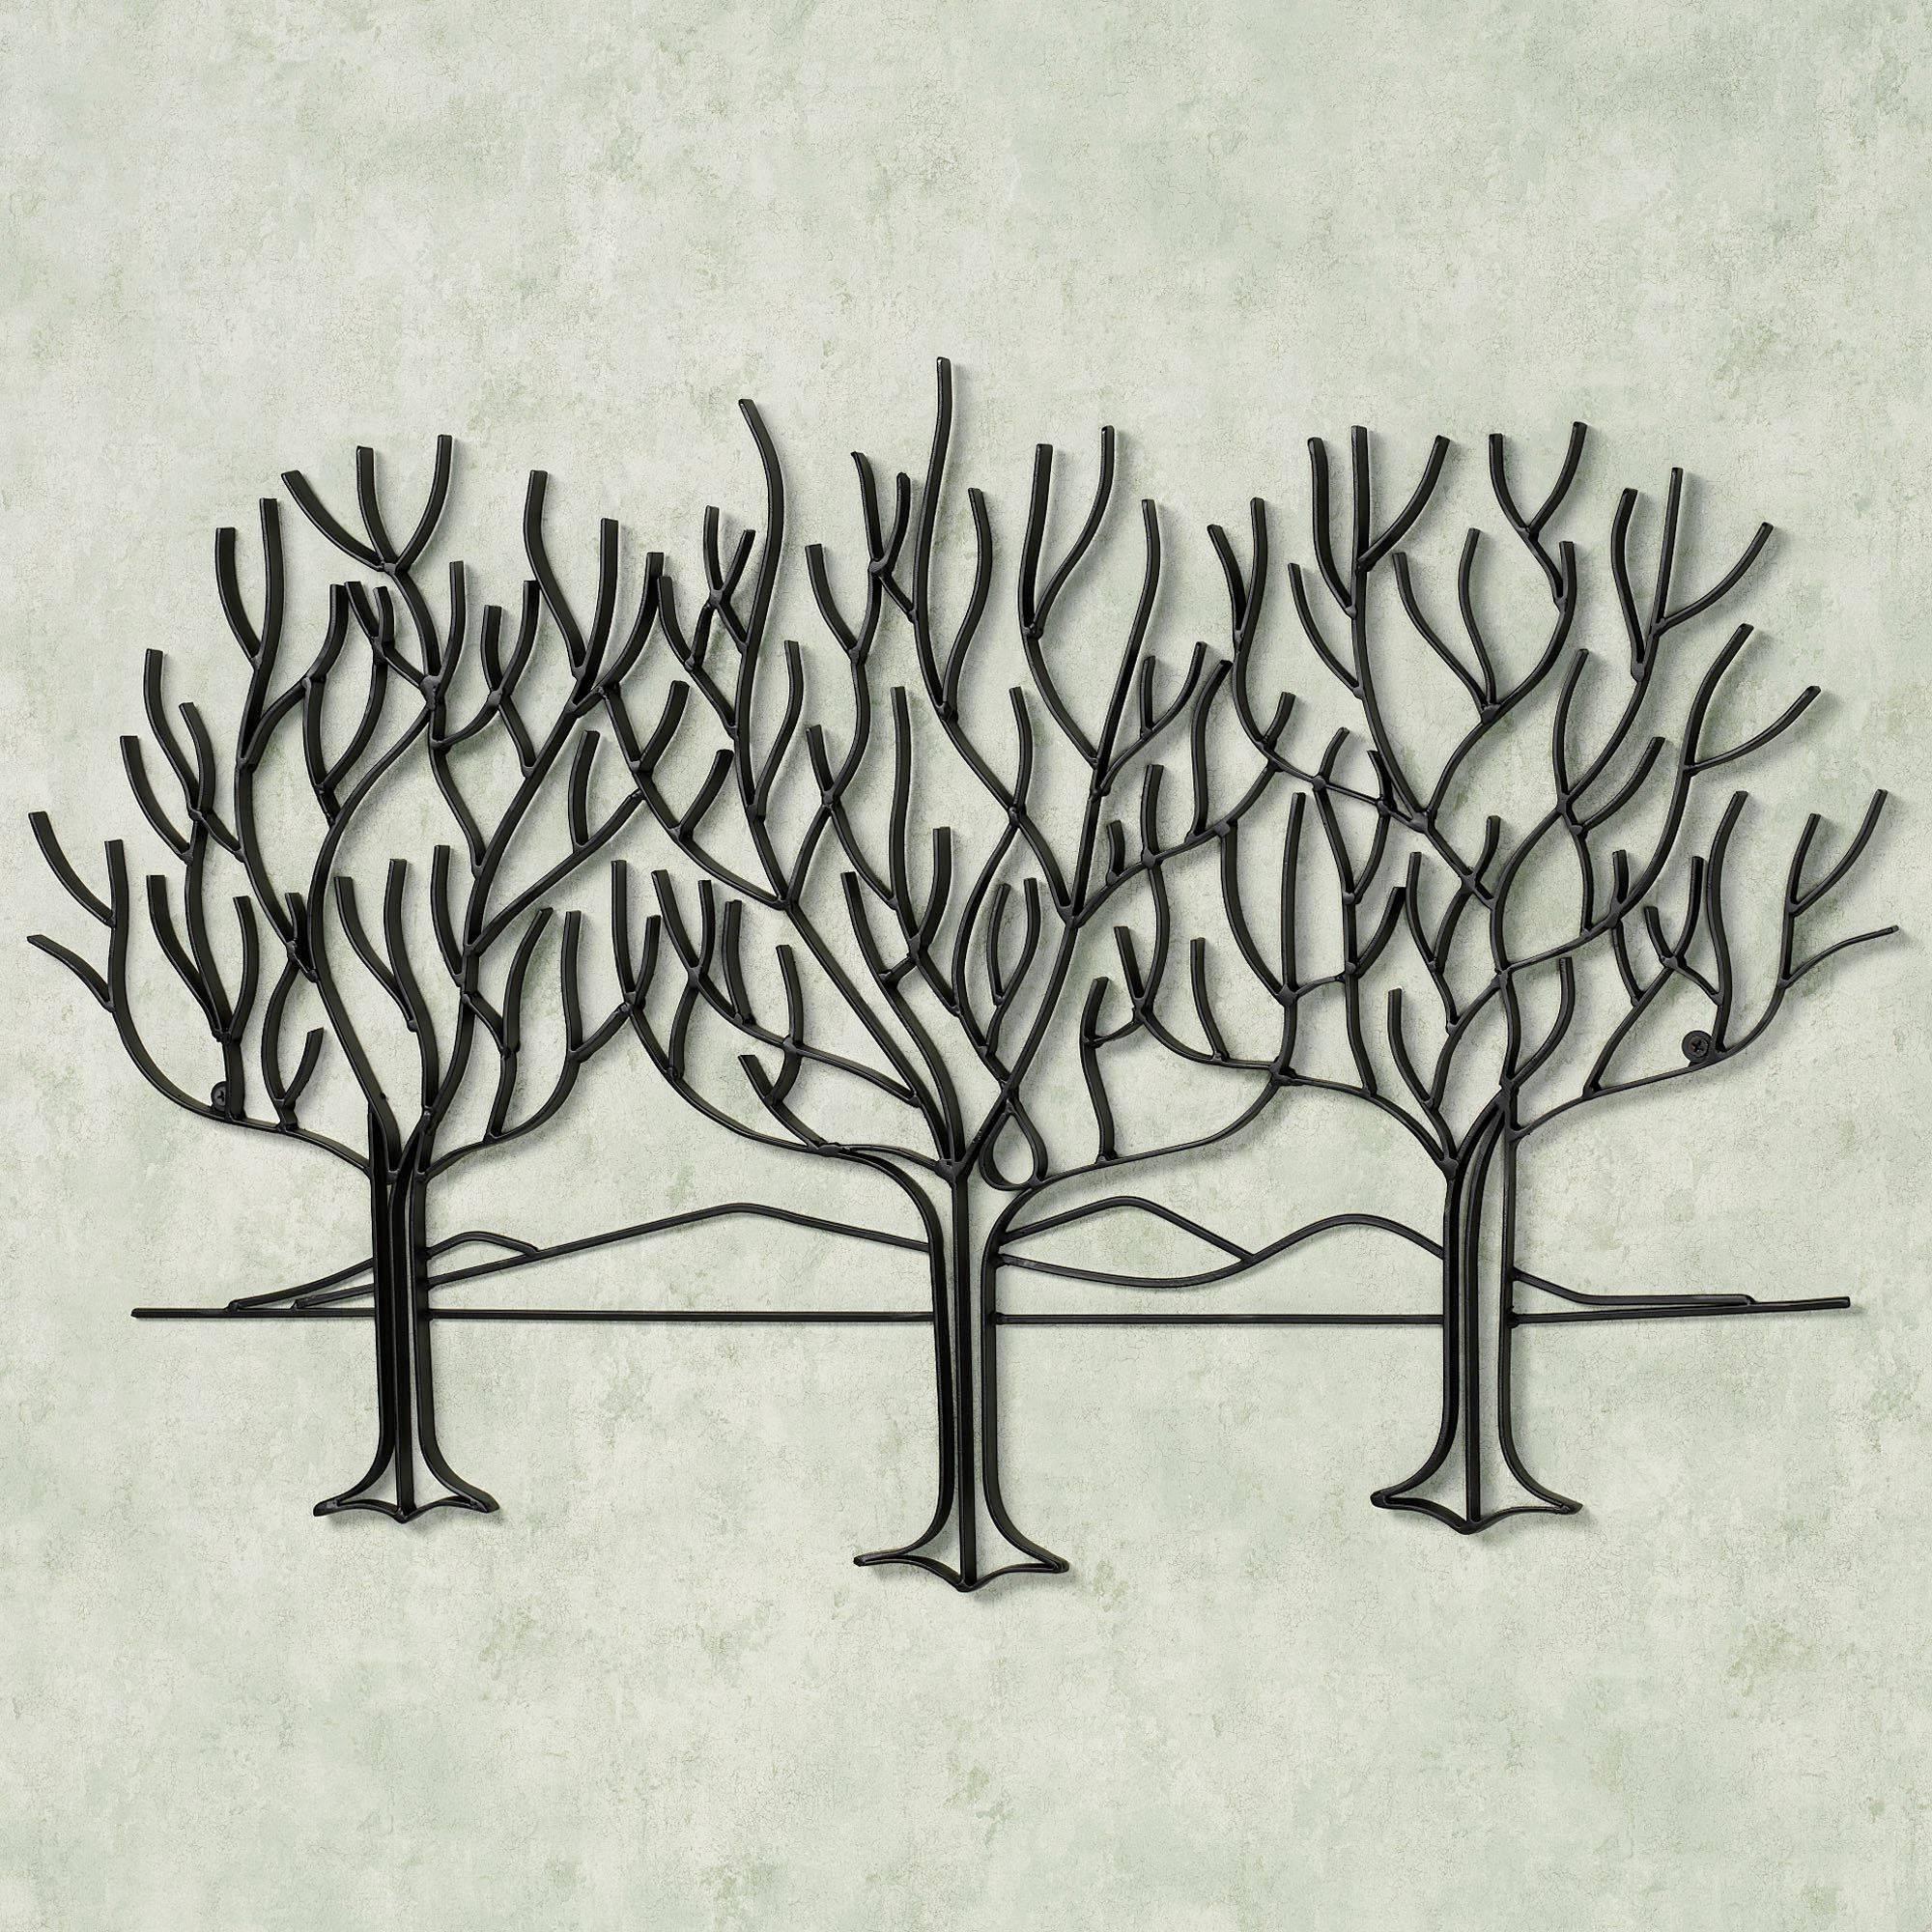 Wall Art Designs: Metal Wall Art Trees Black Metal Wall Art Olive Regarding Most Popular Metal Wall Art Palm Trees (View 6 of 20)